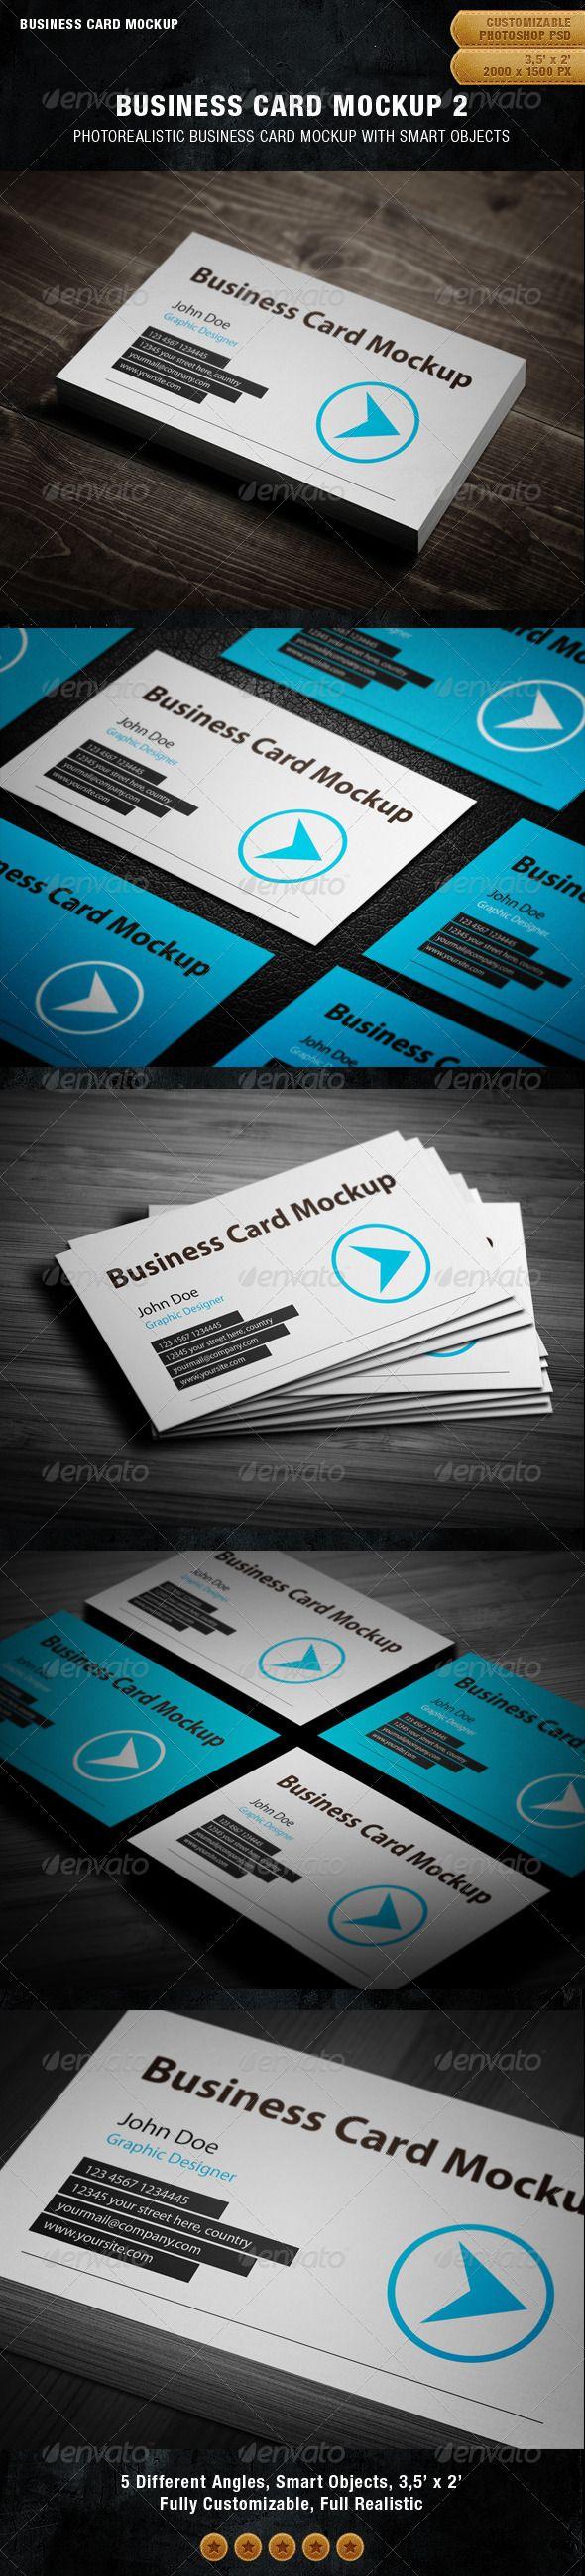 718 best Business Card Mockup images on Pinterest | Miniatures ...